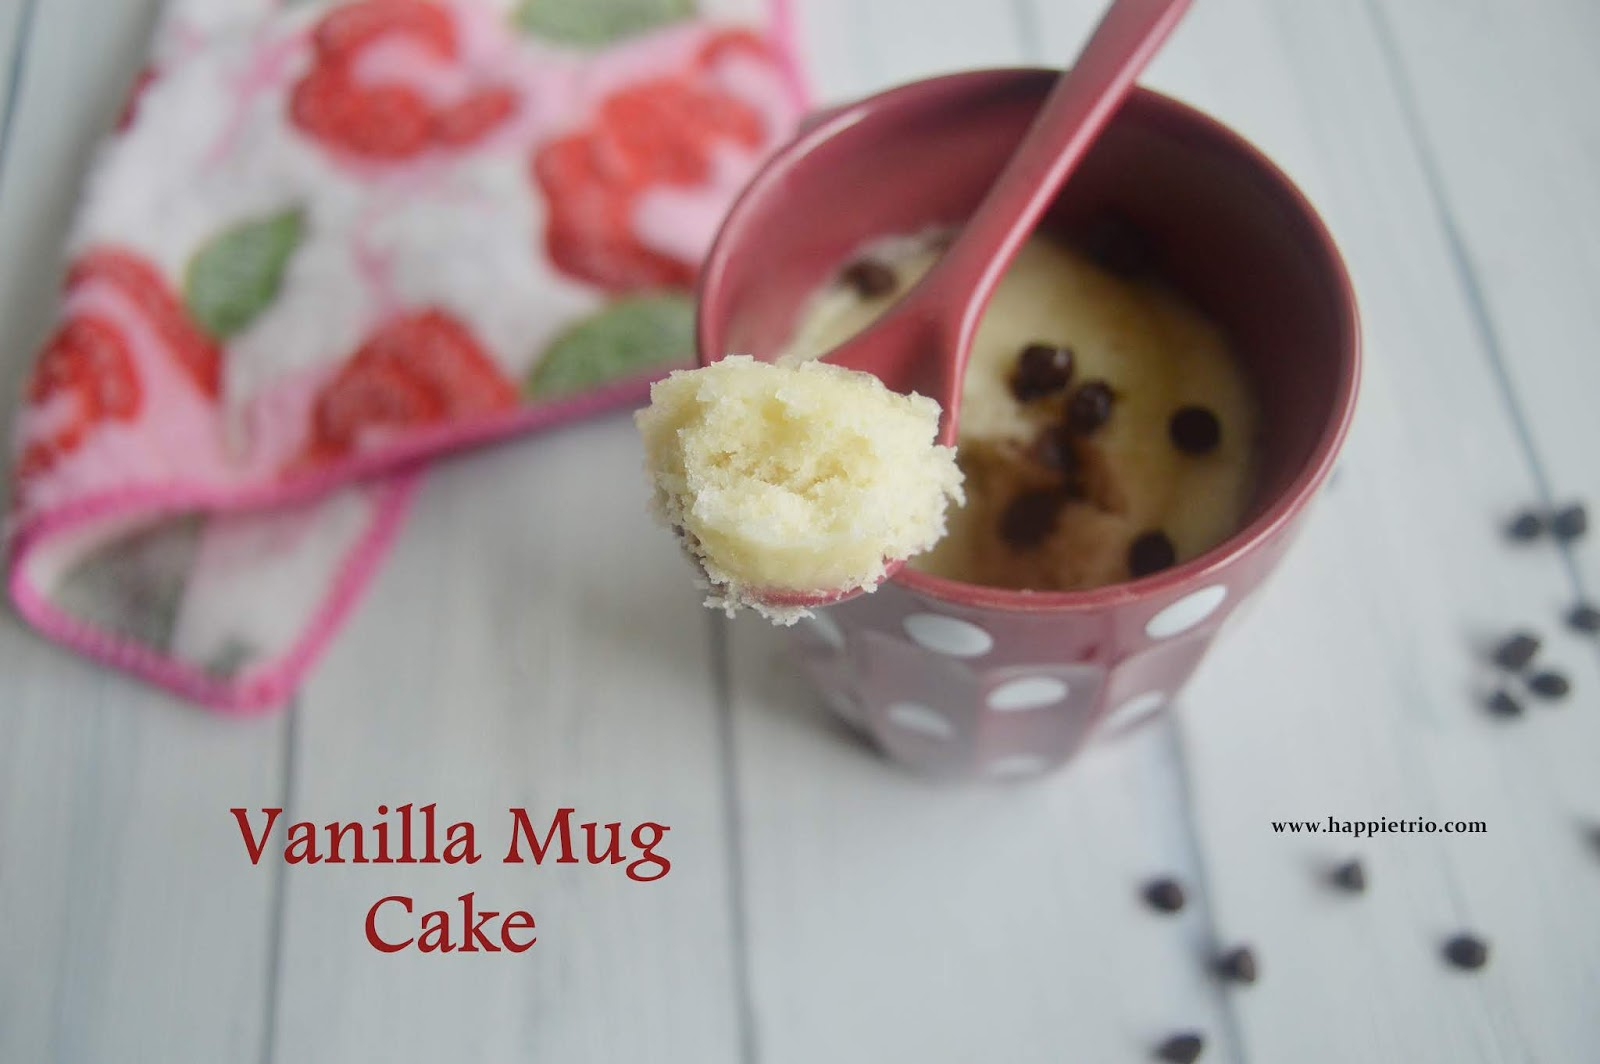 Microwave Vanilla Cake Recipes In A Mug: Eggless Microwave Vanilla Cake